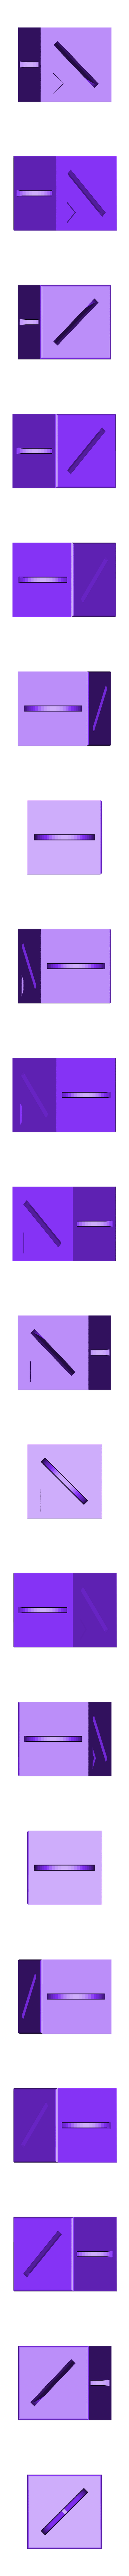 PennyPixelBlockZeroFaces.stl Download free STL file 3D Penny-Powered Pixel Art Blocks - Video Game Art • Model to 3D print, tonyyoungblood